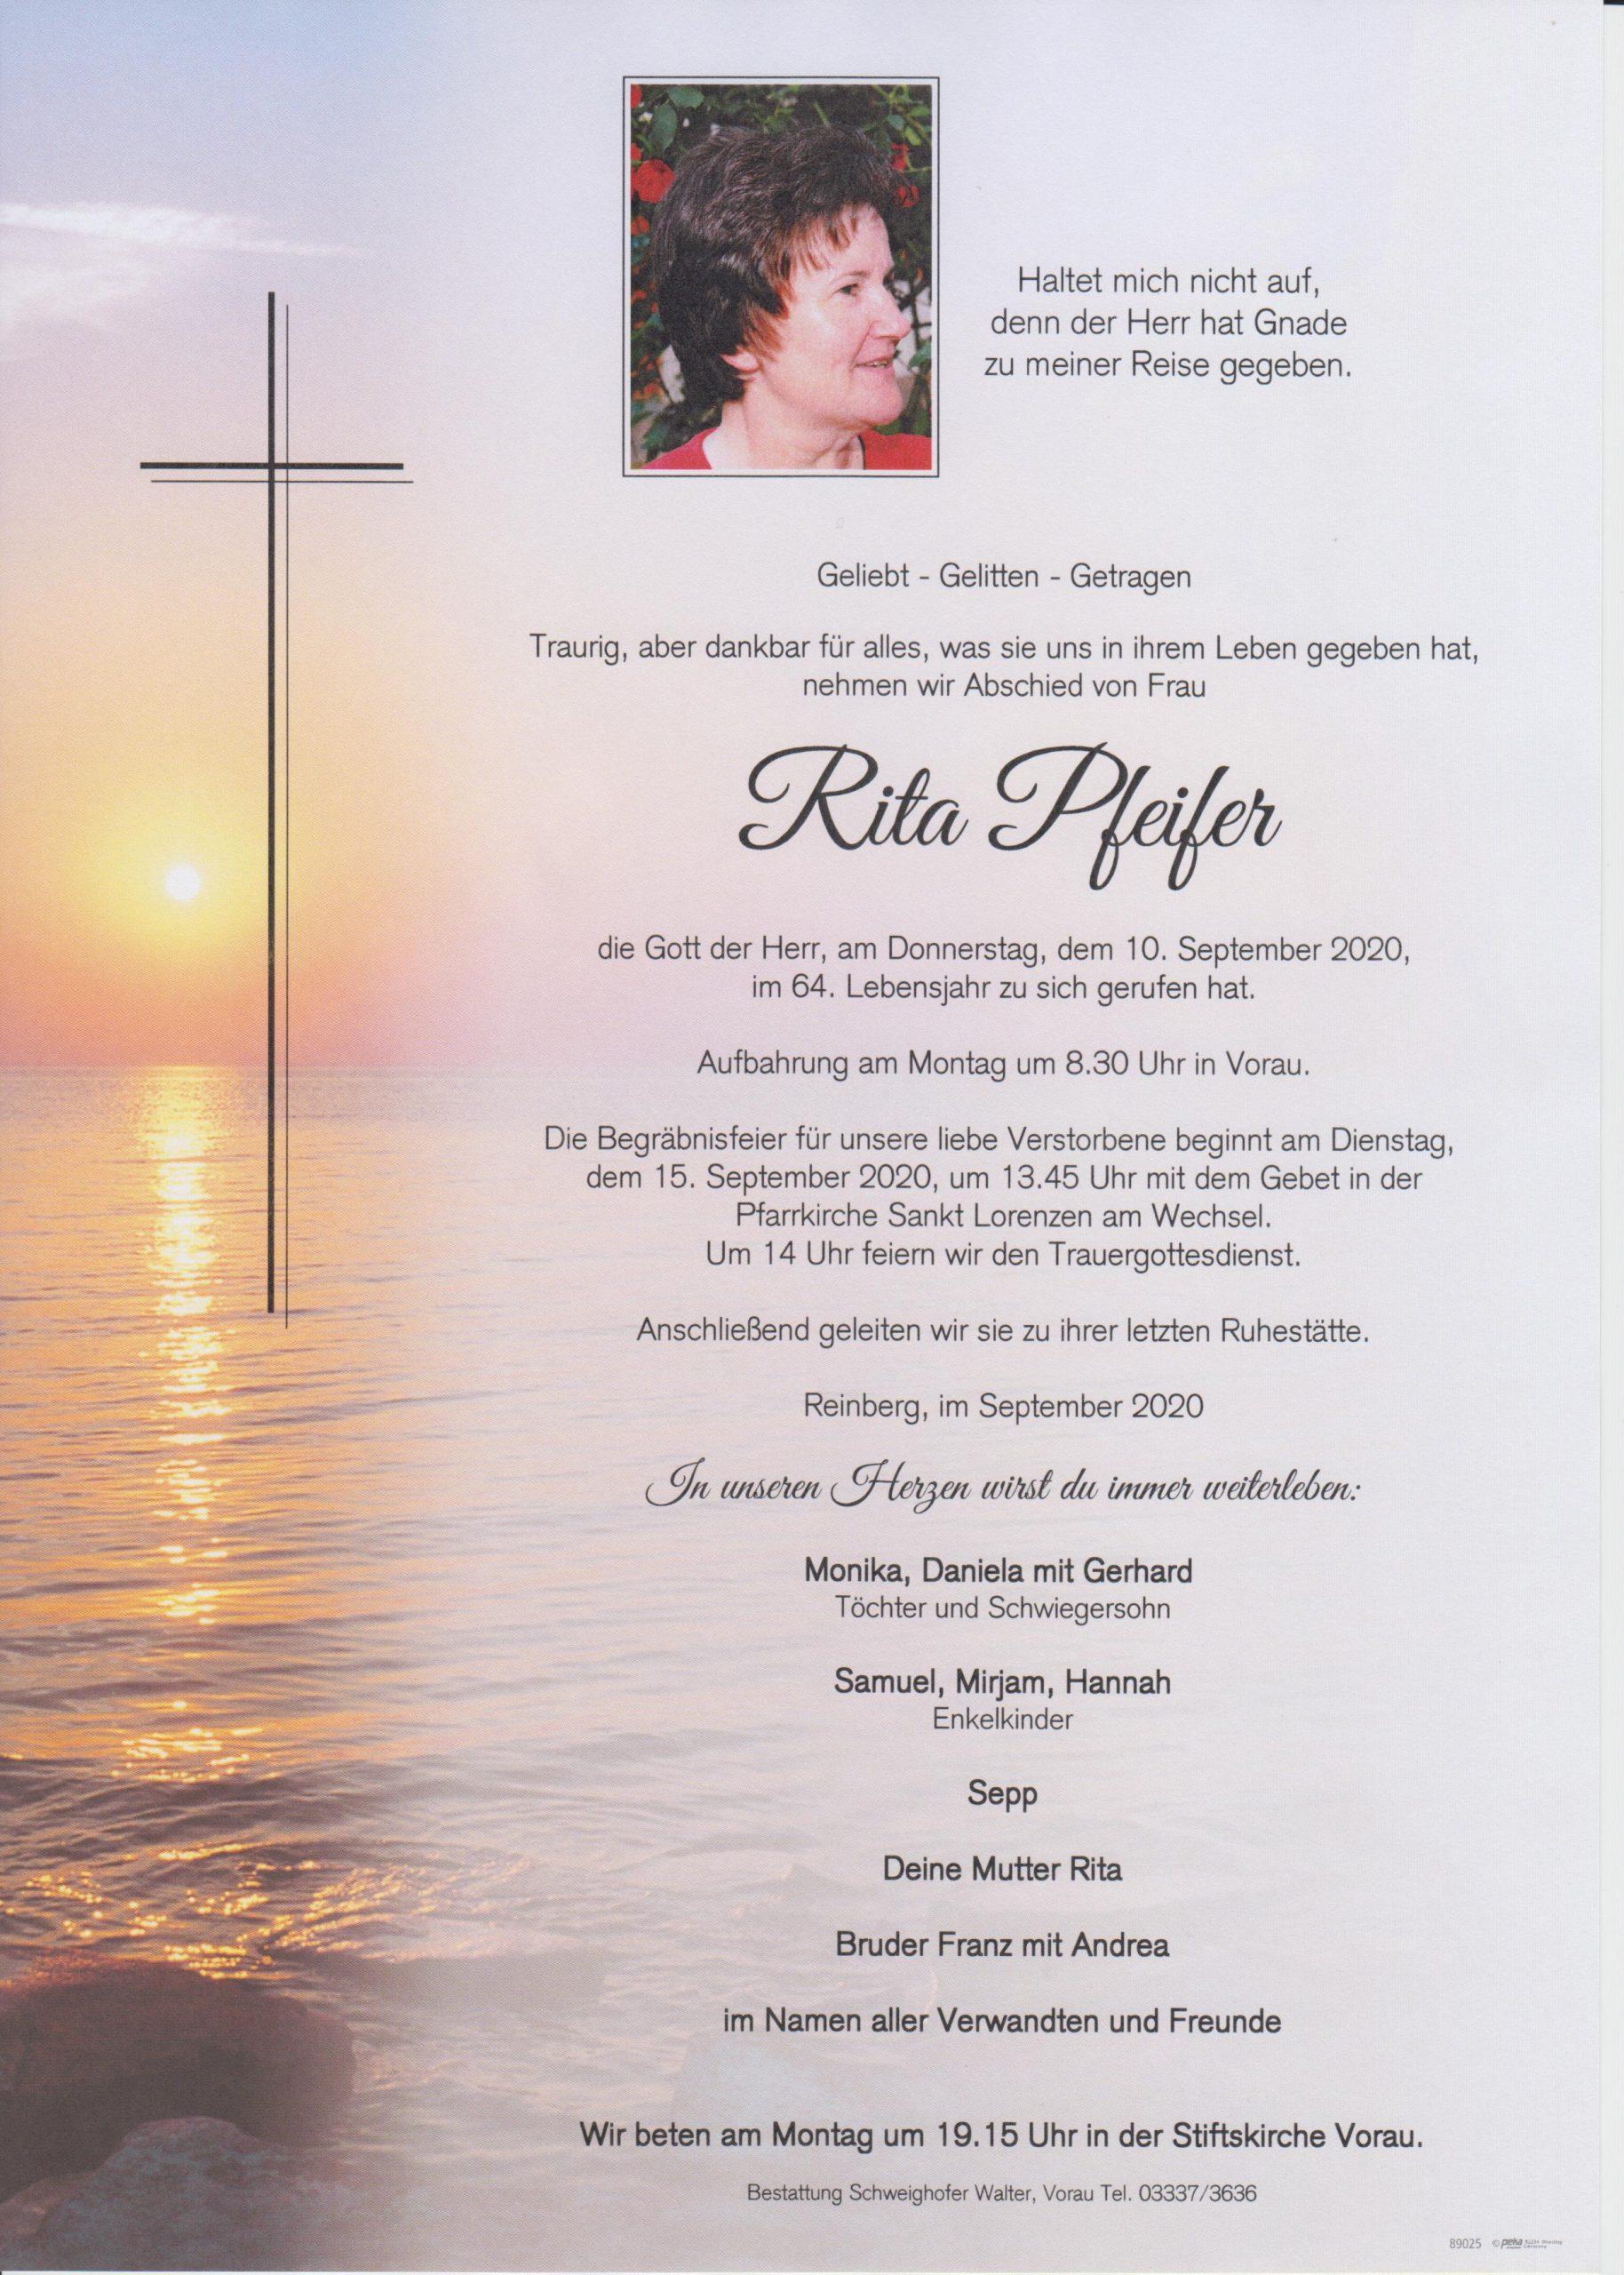 Rita Pfeifer